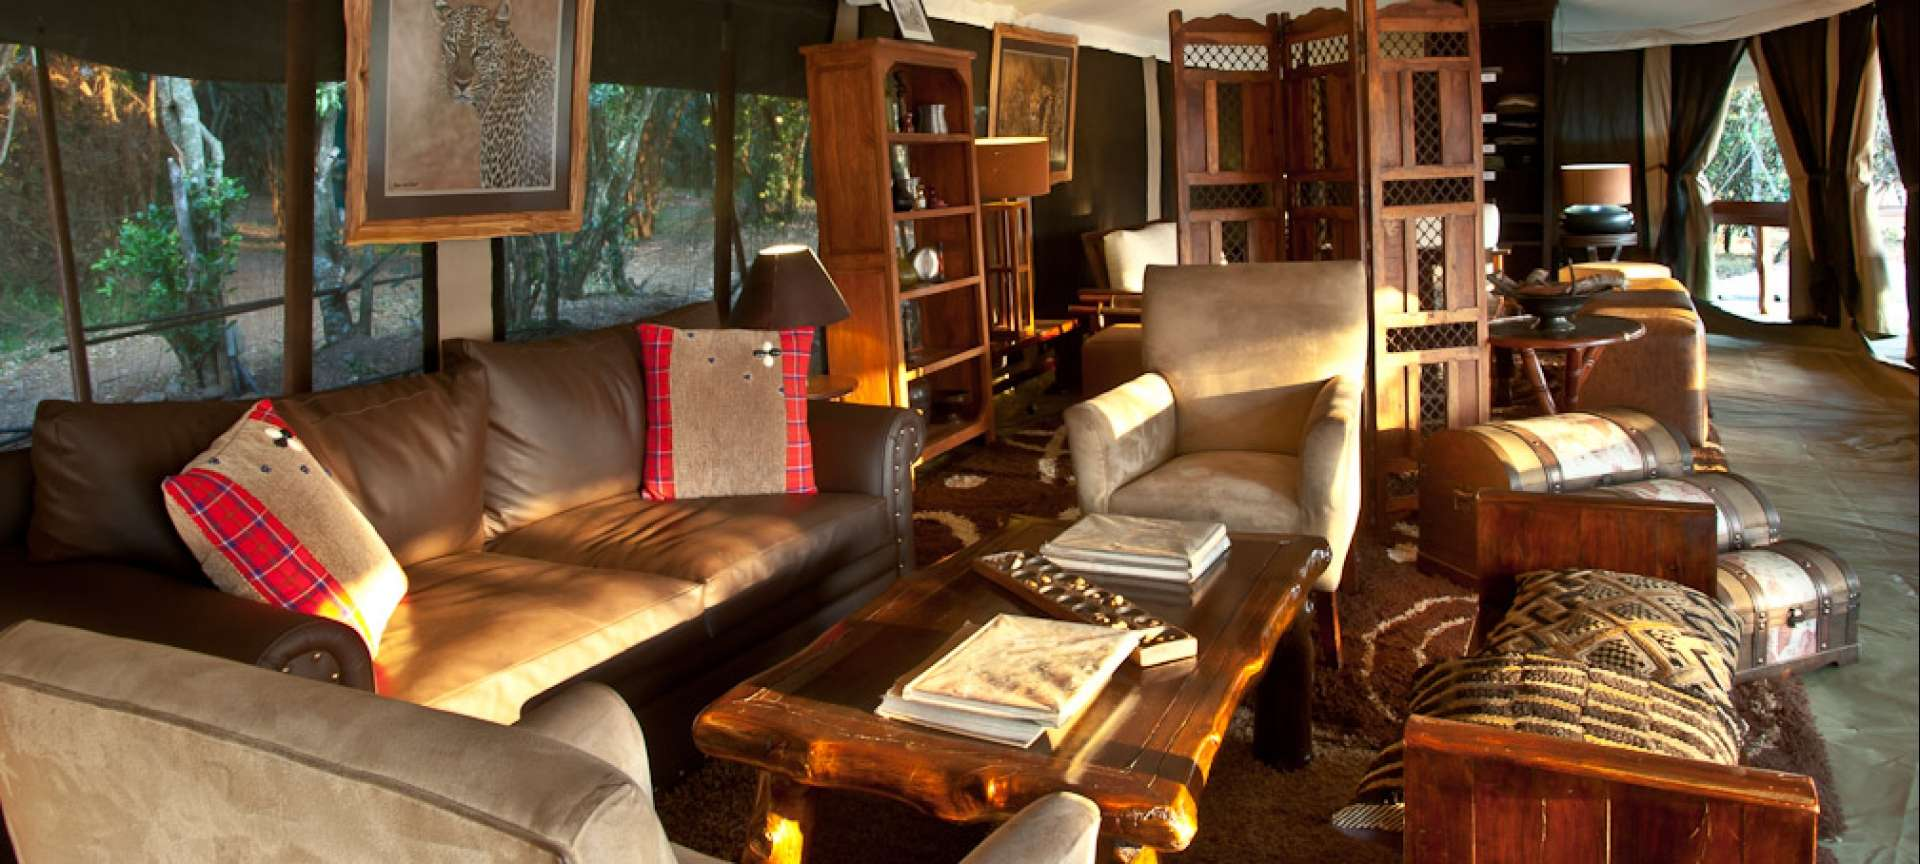 Entim Camp Kenya Discover Africa Safaris